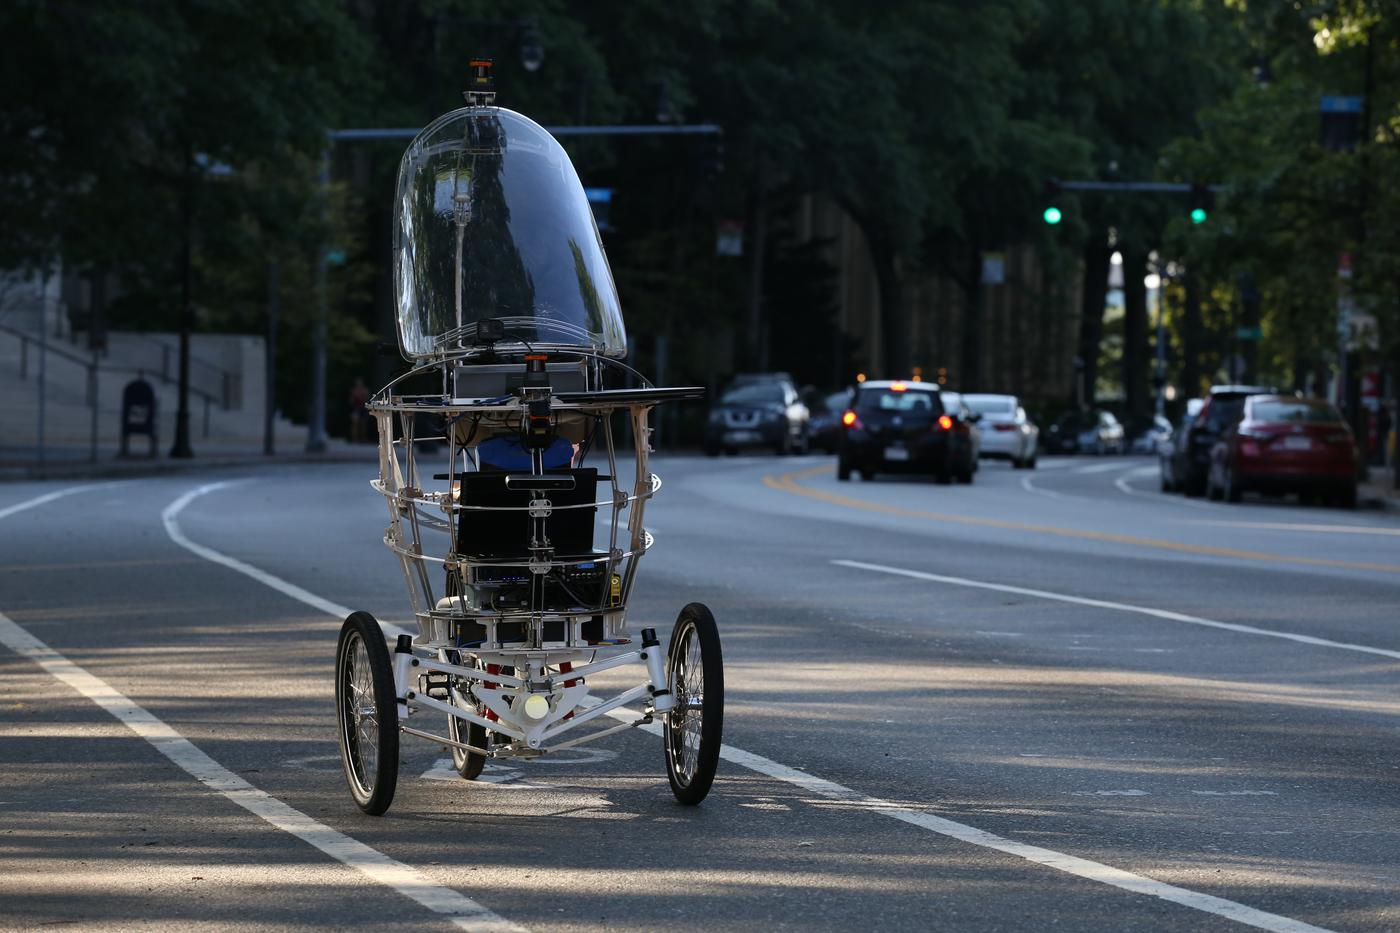 Bicicleta autônoma: PEV